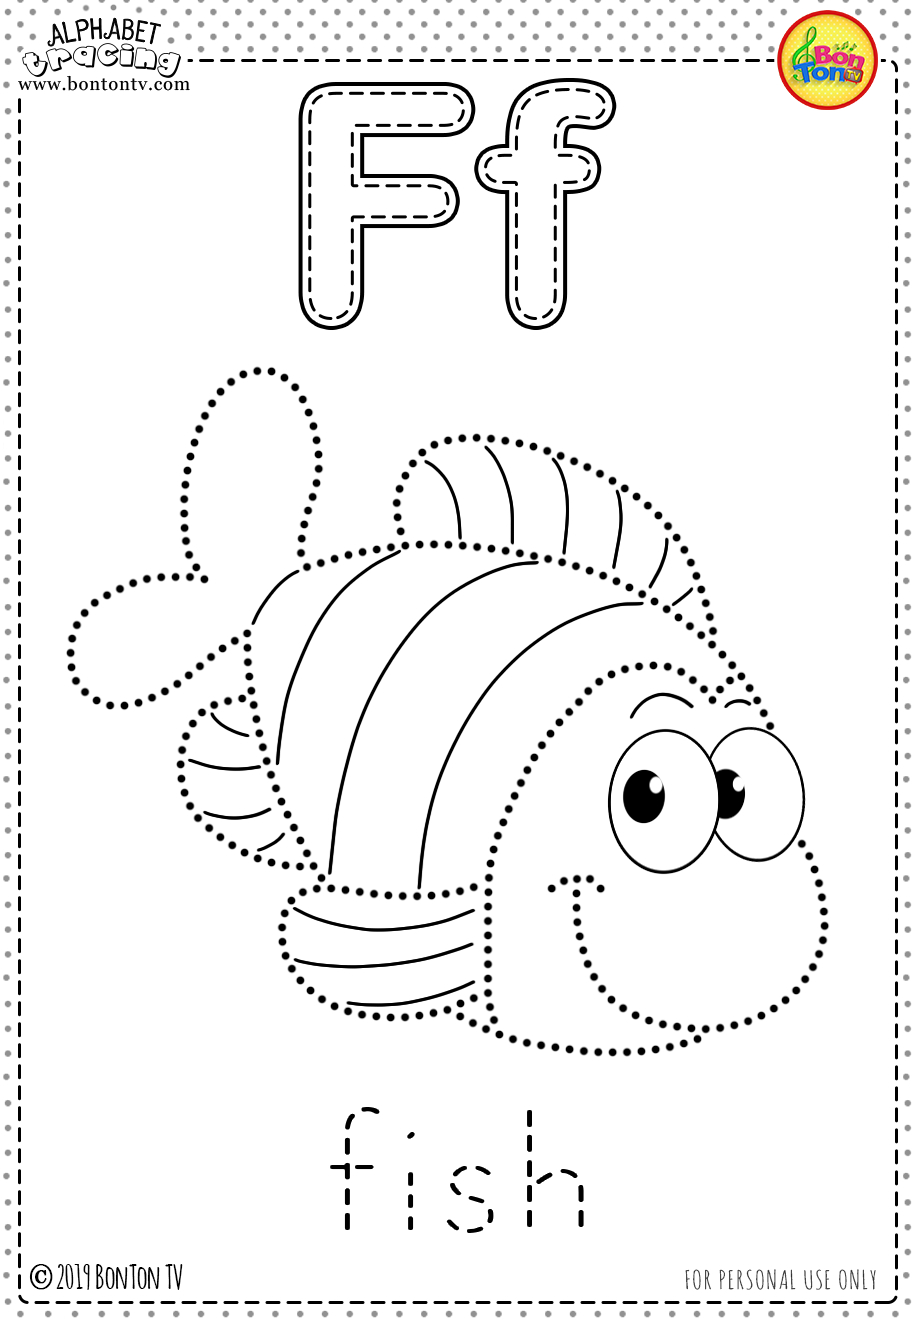 Free Preschool Printables - Alphabet Tracing And Coloring with Alphabet Tracing And Coloring Pages